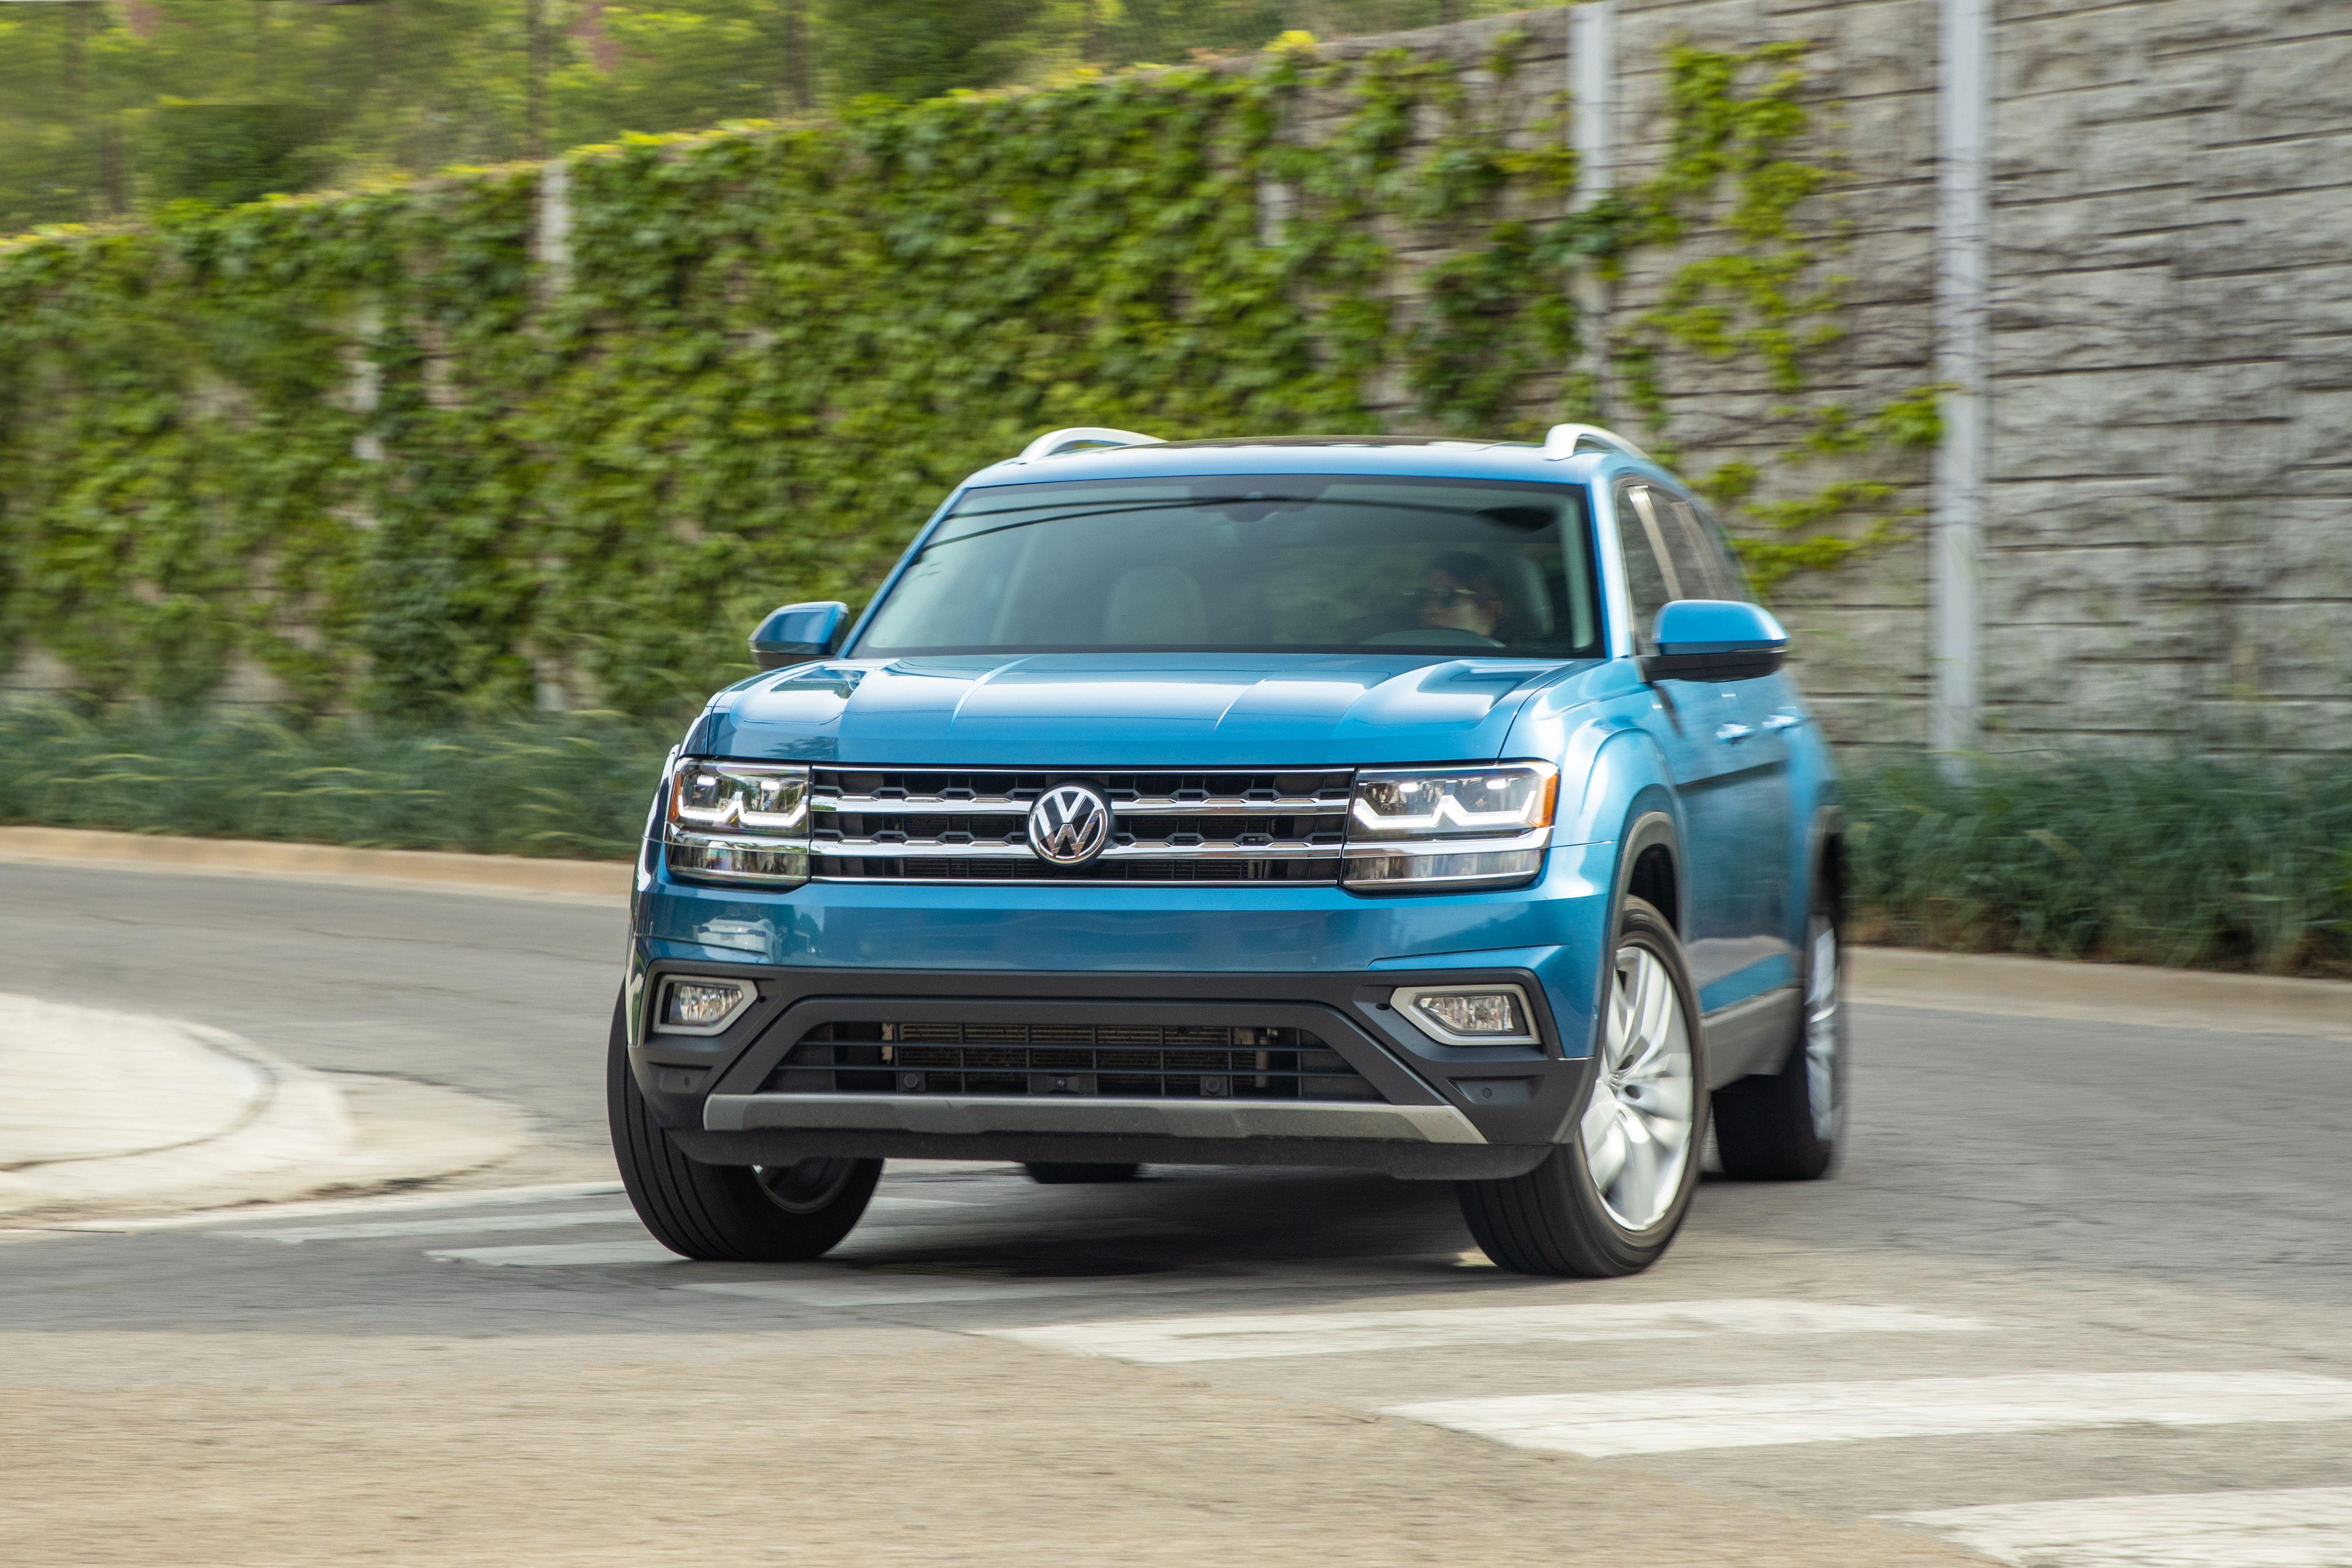 2019 Volkswagen Atlas Long Term Road Test 40 000 Mile Wrap Up